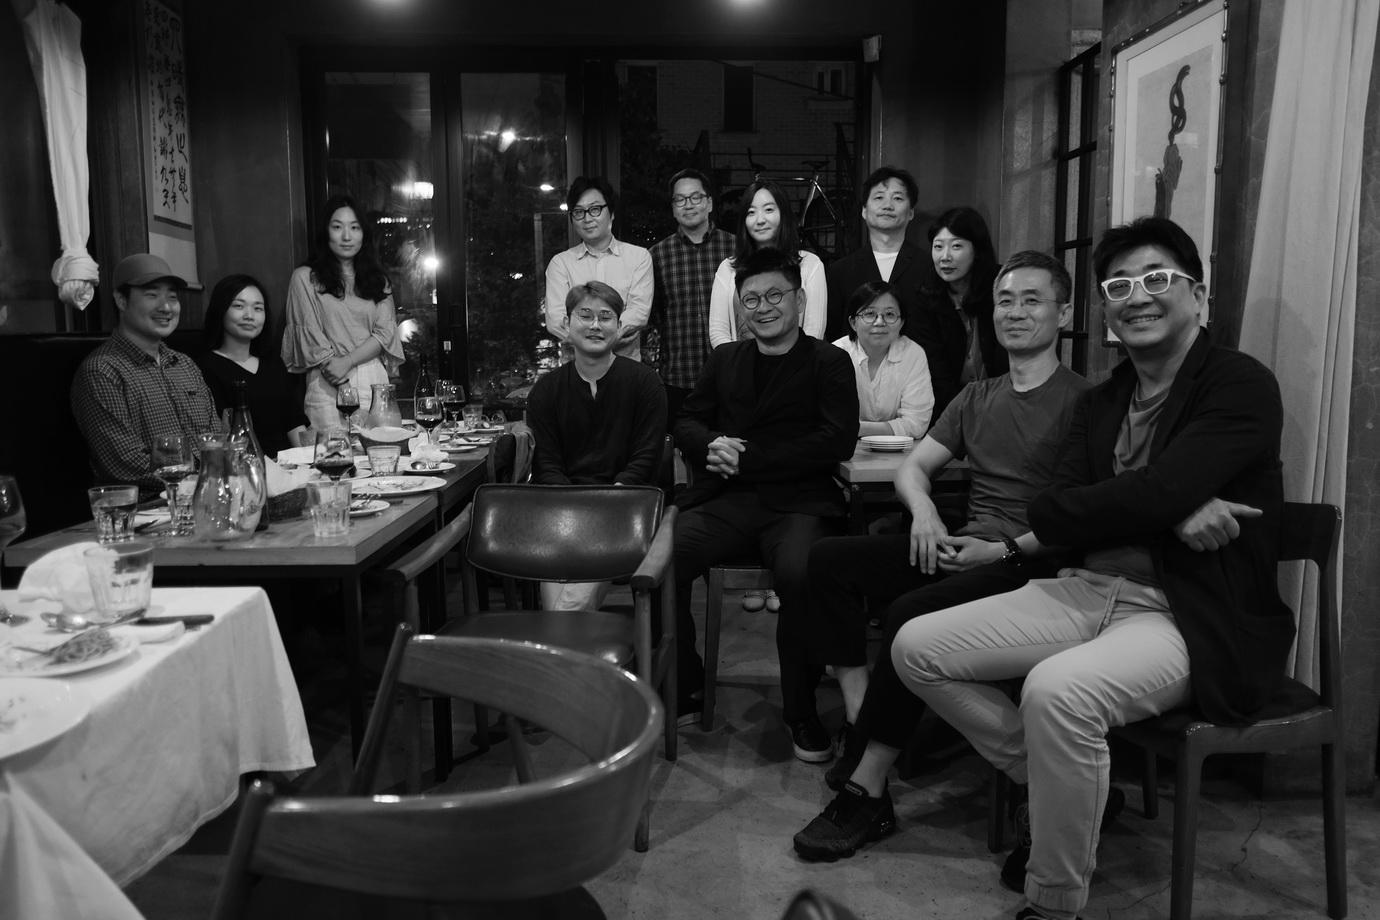 2019-05-27 20-48-agi korea_041_resize